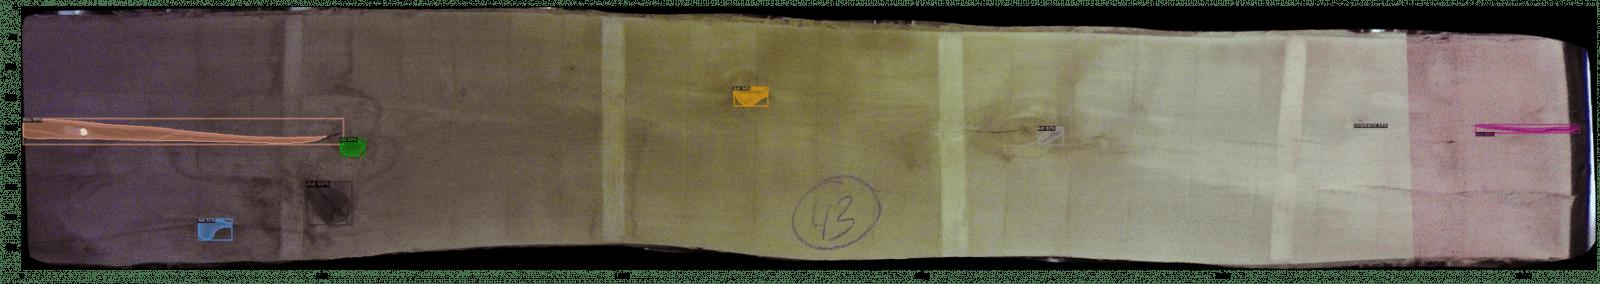 20210119_Projekt_HolzwerkKeck_KI_Bild1.3